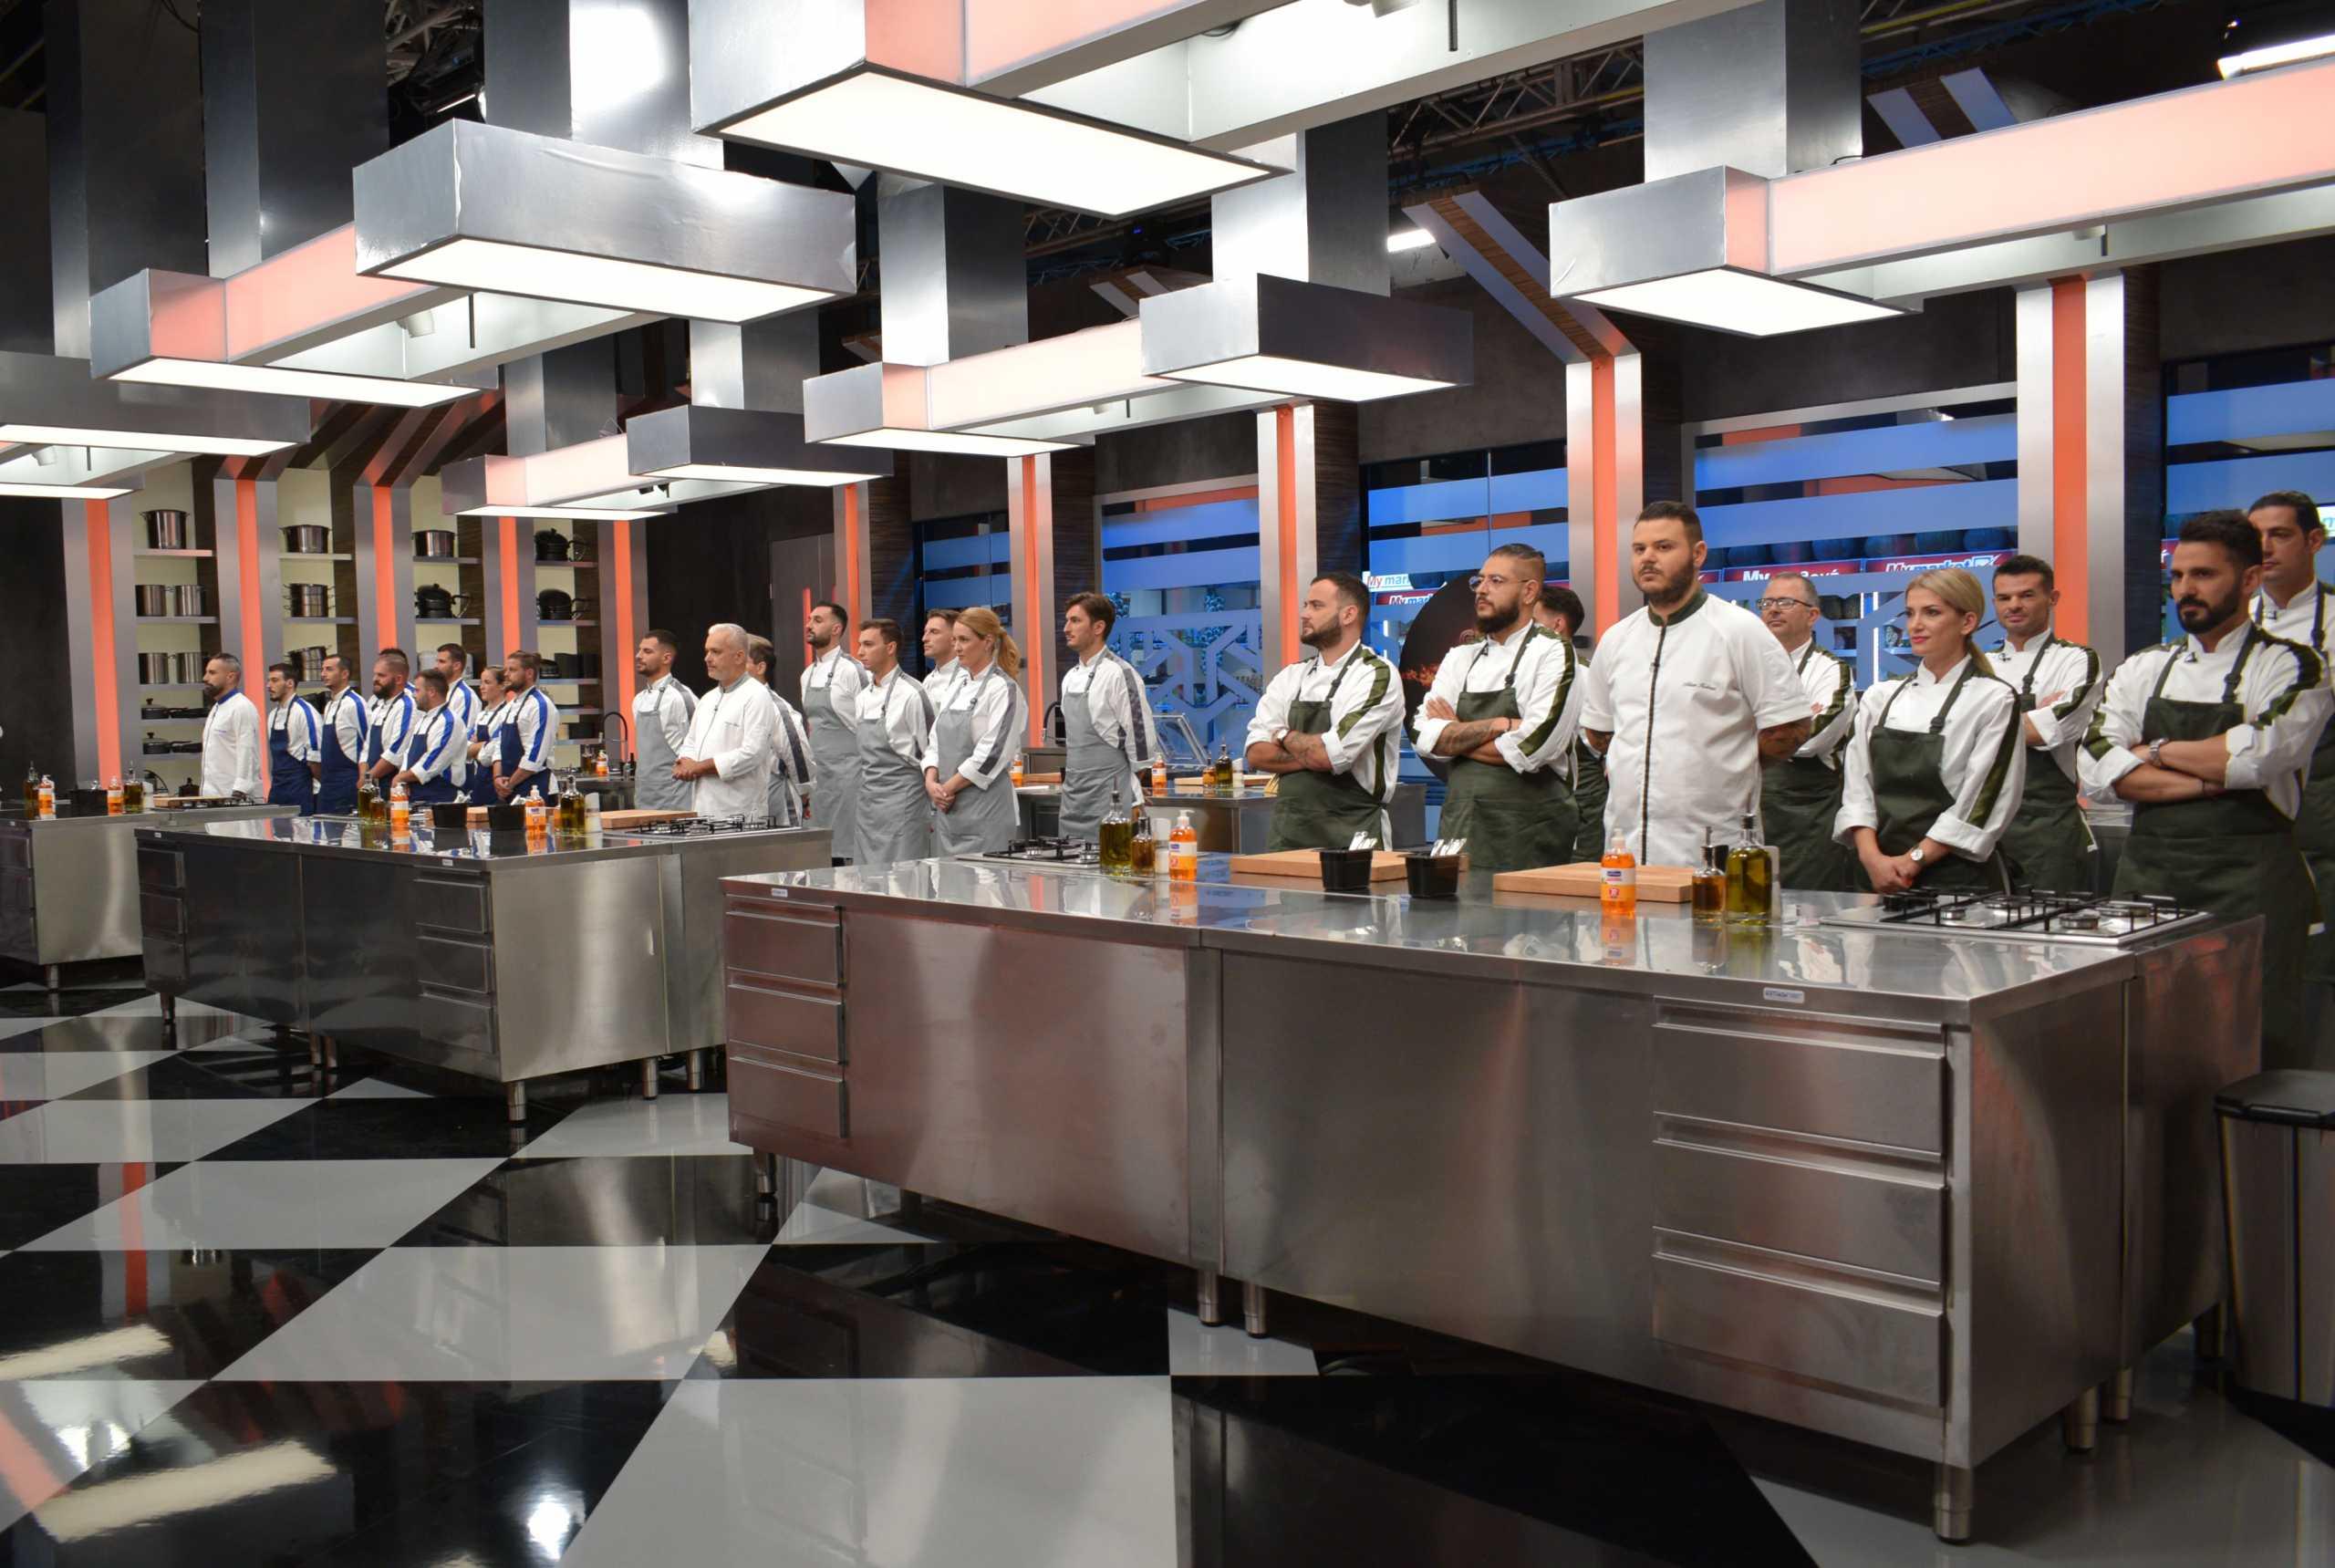 Game Of Chefs: Σκληρή μονομαχία στα Kitchen Battles – Η δοκιμασία που κρίνει τη συνέχεια